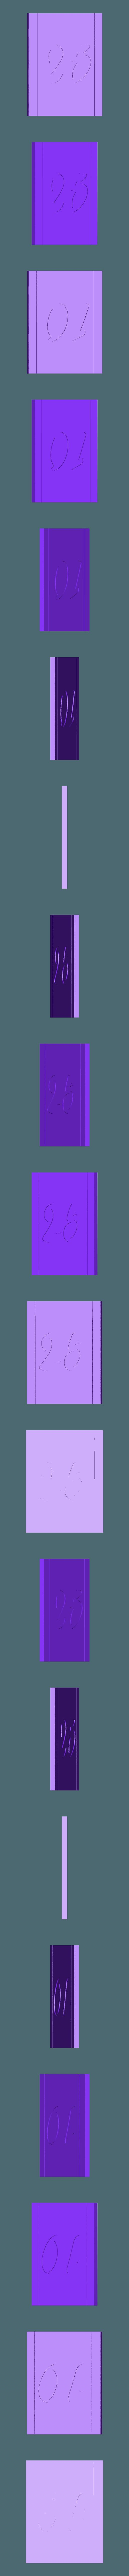 25_-_10.stl Download free SCAD file Perpetual Flip Calendar (W/ Customizable Font) • 3D printable model, Dsk